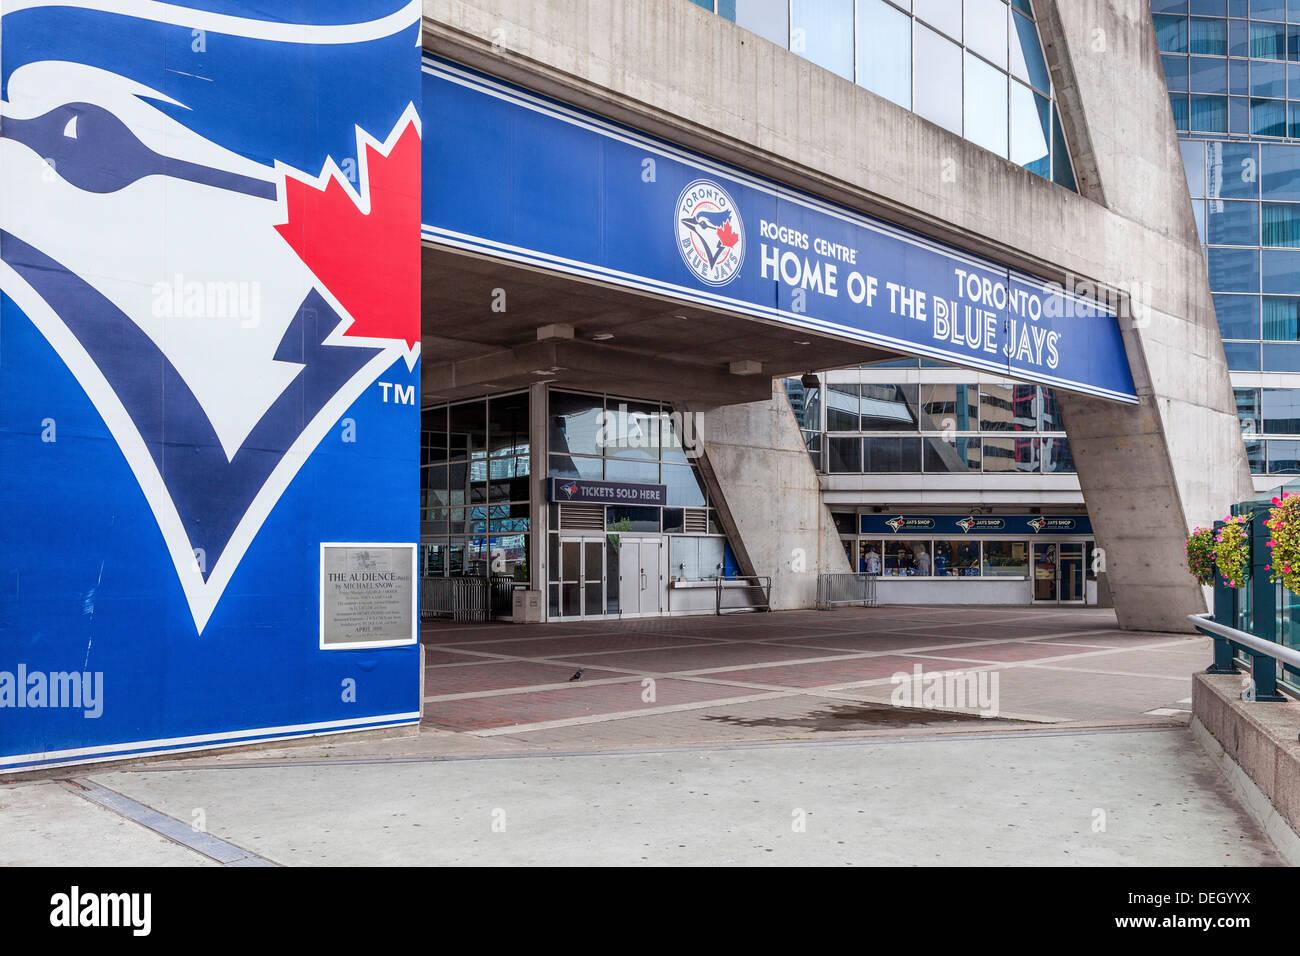 Rogers Centre, stadium of the Blue Jays baseball team, Toronto - Stock Image